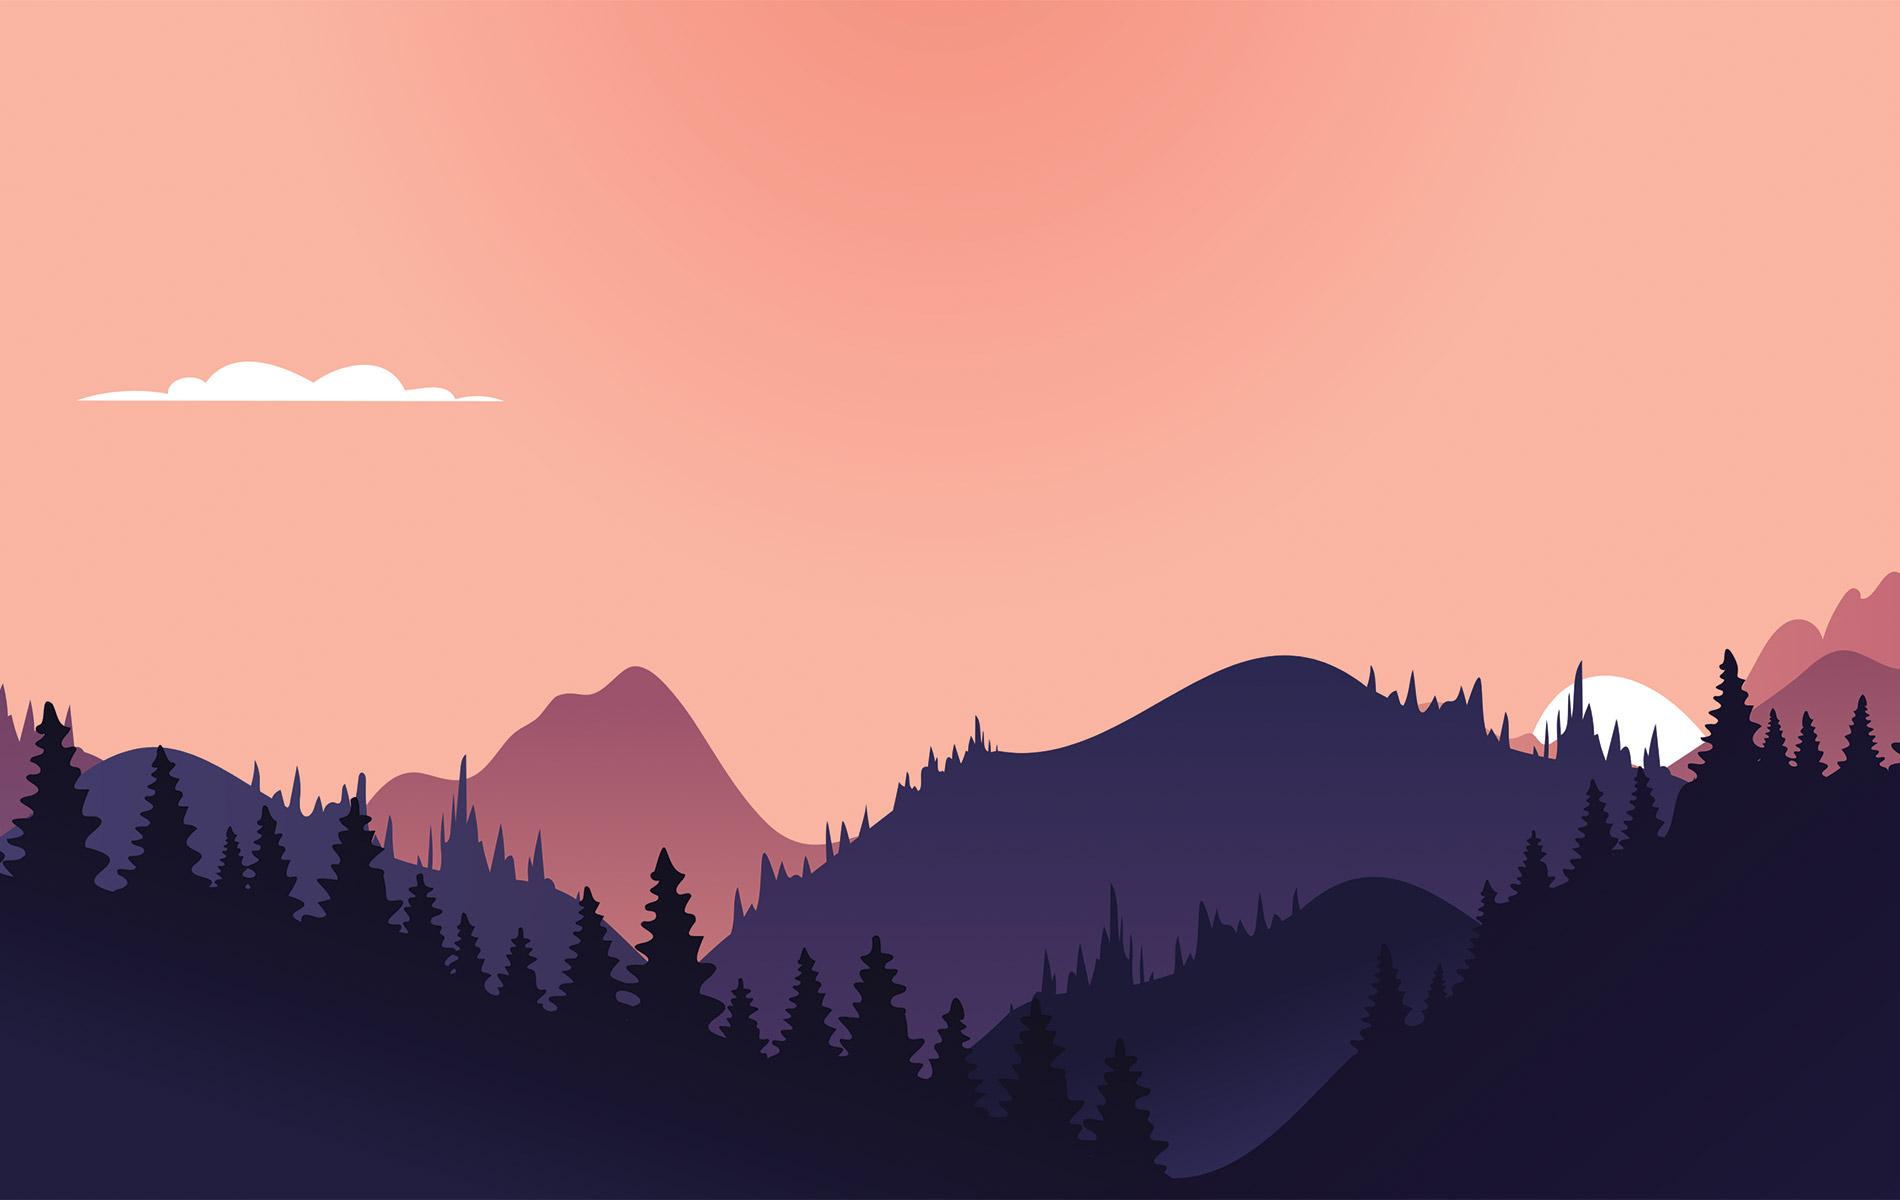 Parallax Scroll Animation